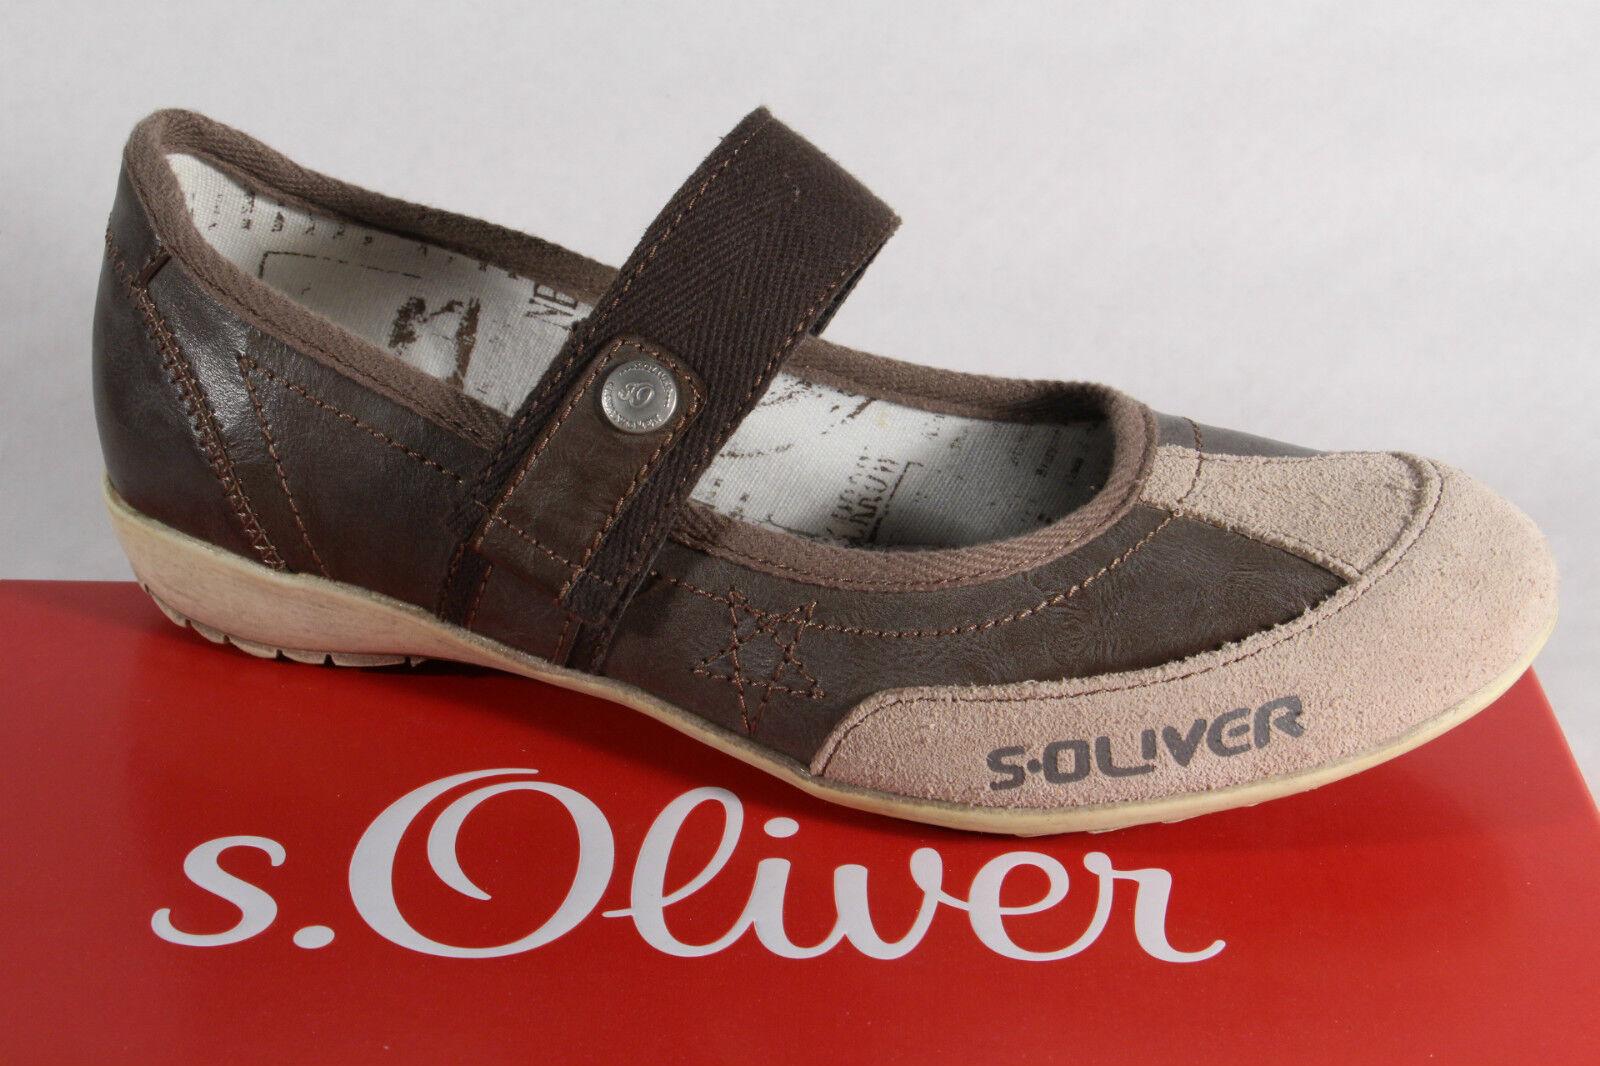 S.Oliver Ballerine Mocassins Chaussures Basses Femme Marron Beige Neuf